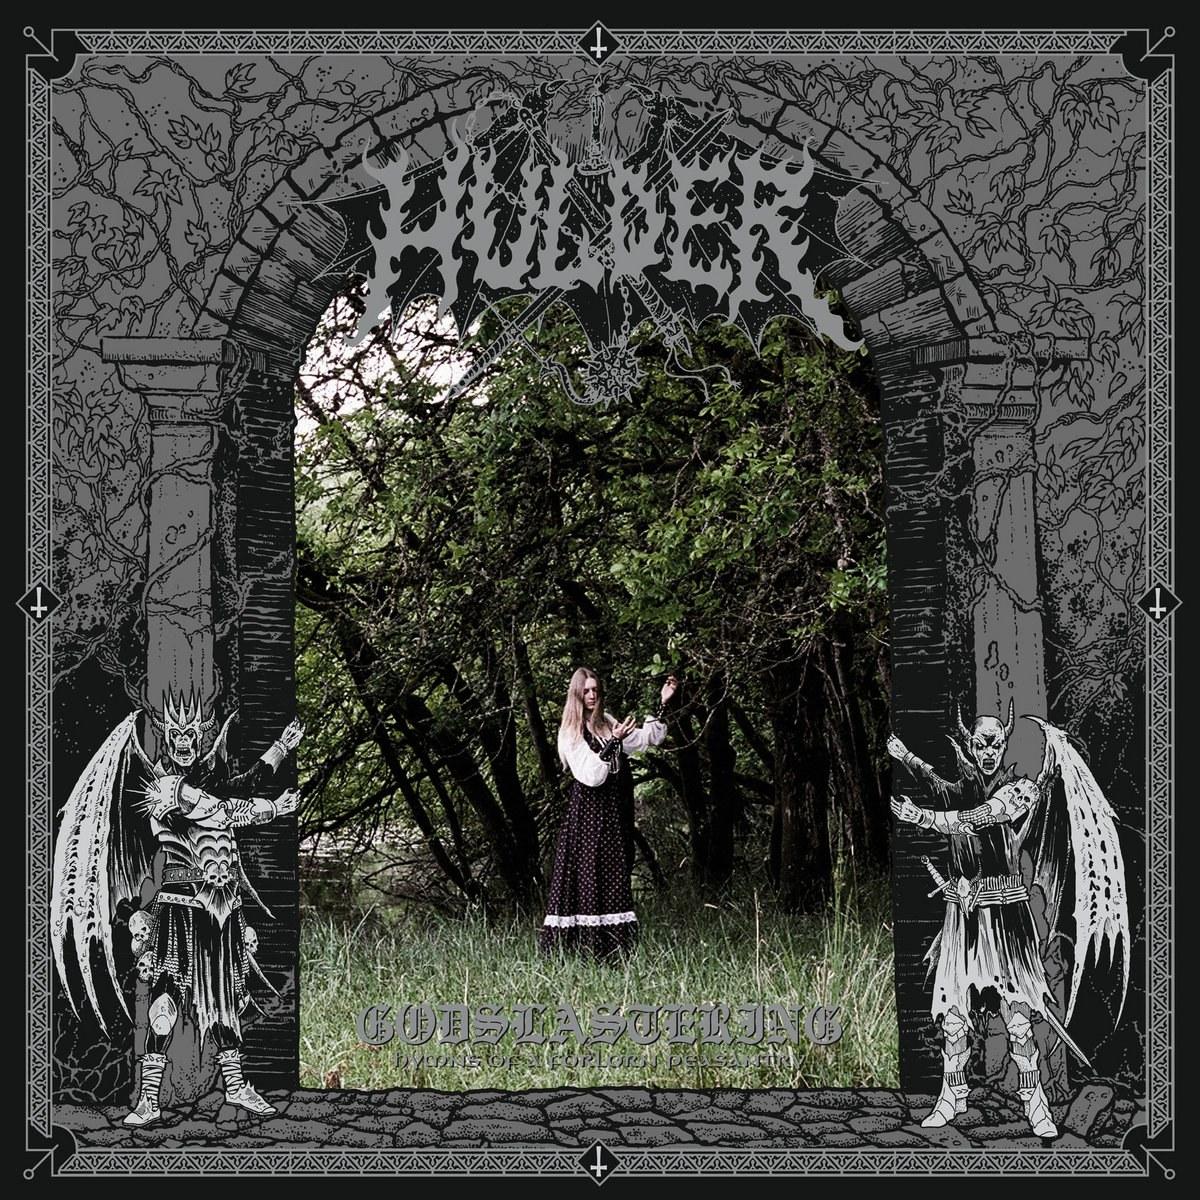 Reviews for Hulder (USA) - Godslastering: Hymns of a Forlorn Peasantry